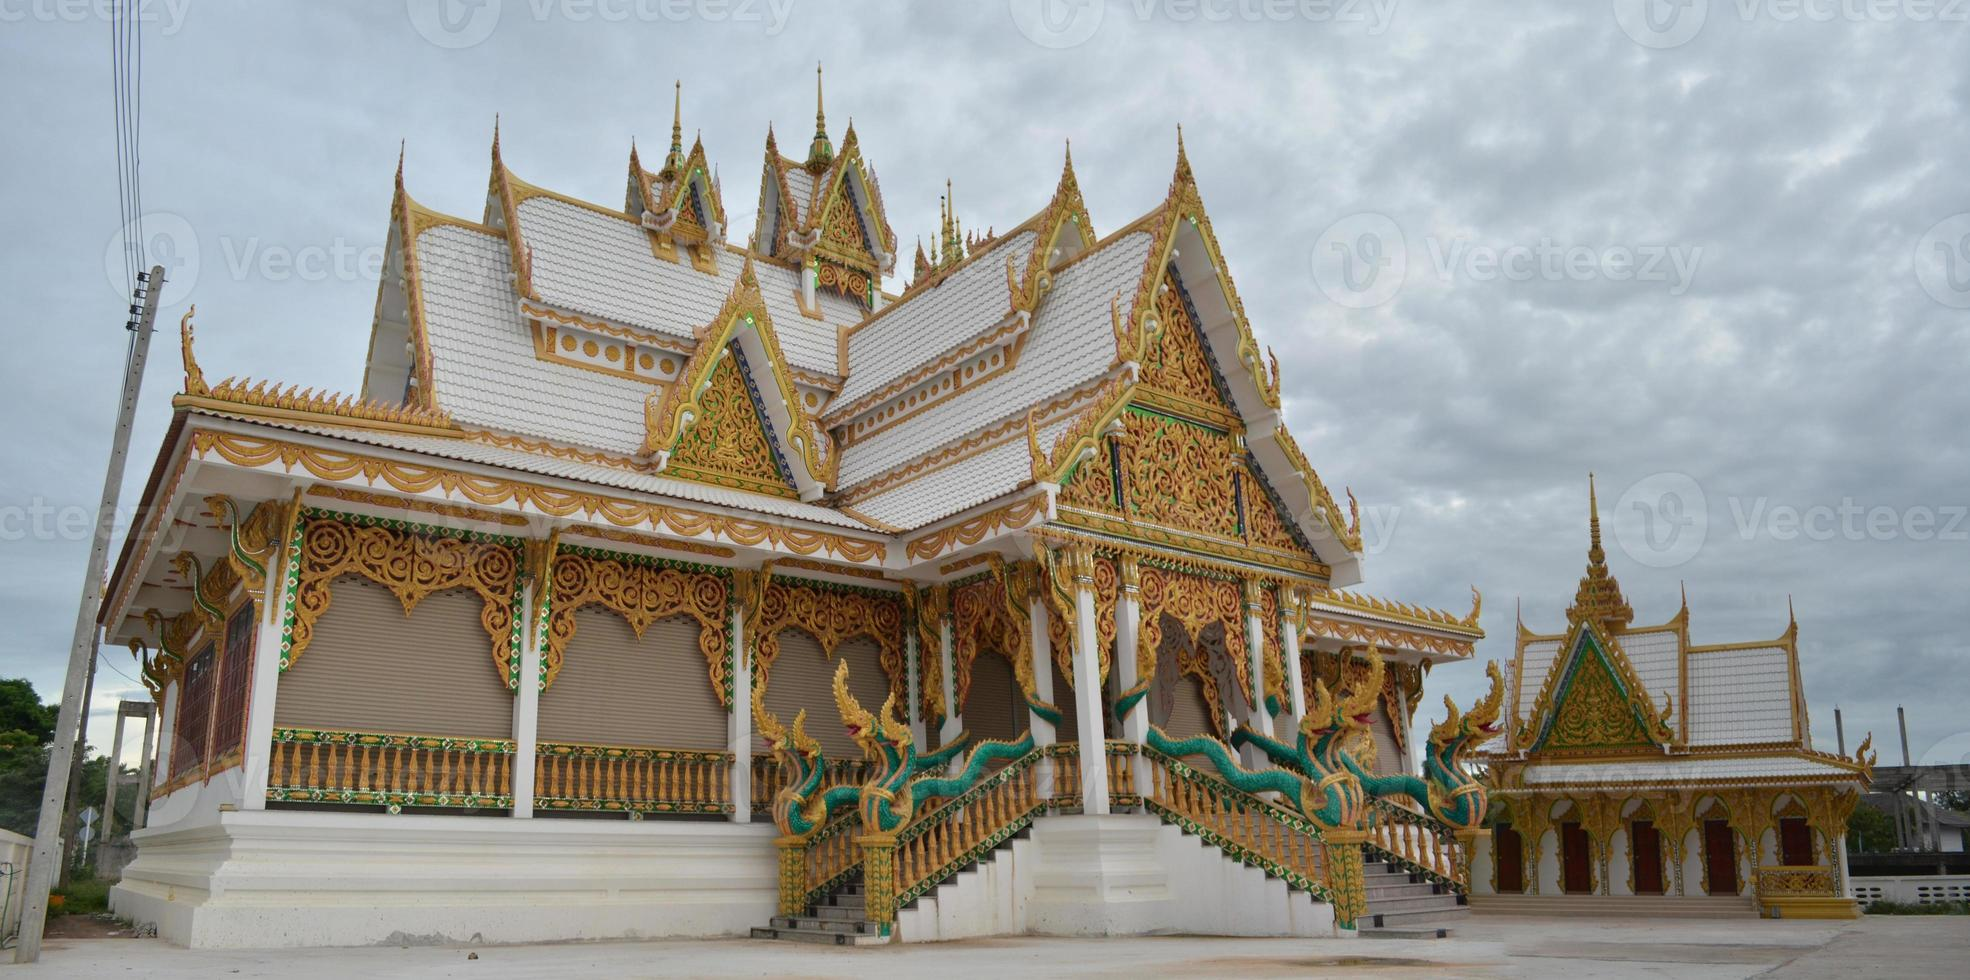 grande templo dourado da tailândia foto